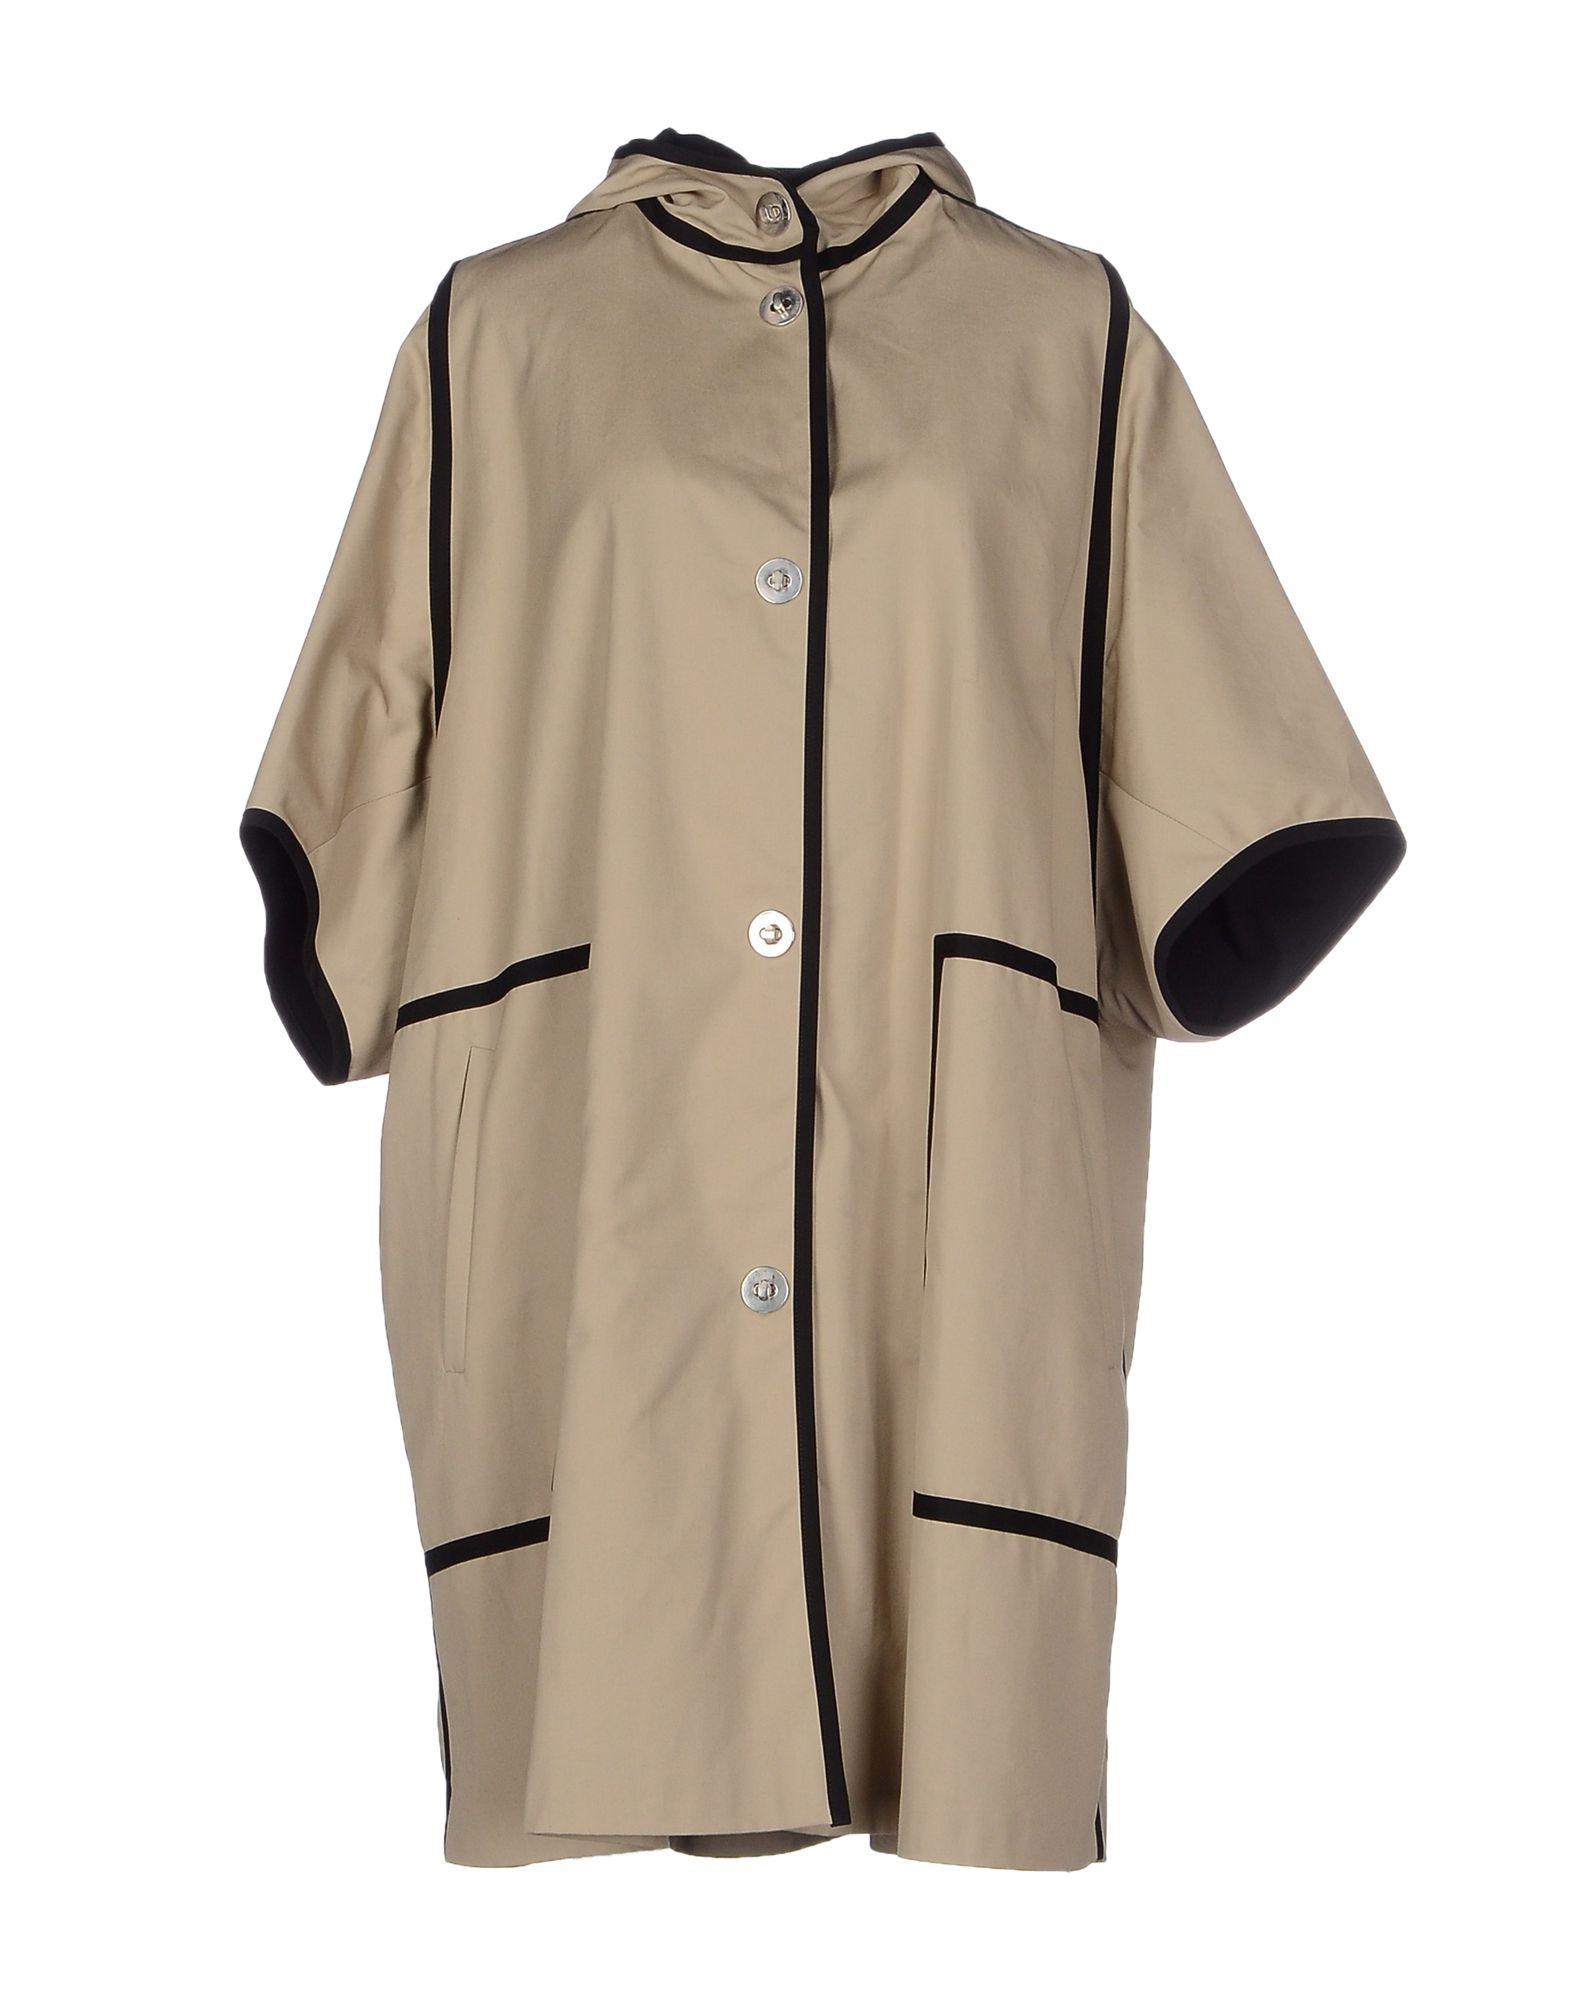 michael kors female michael kors overcoats